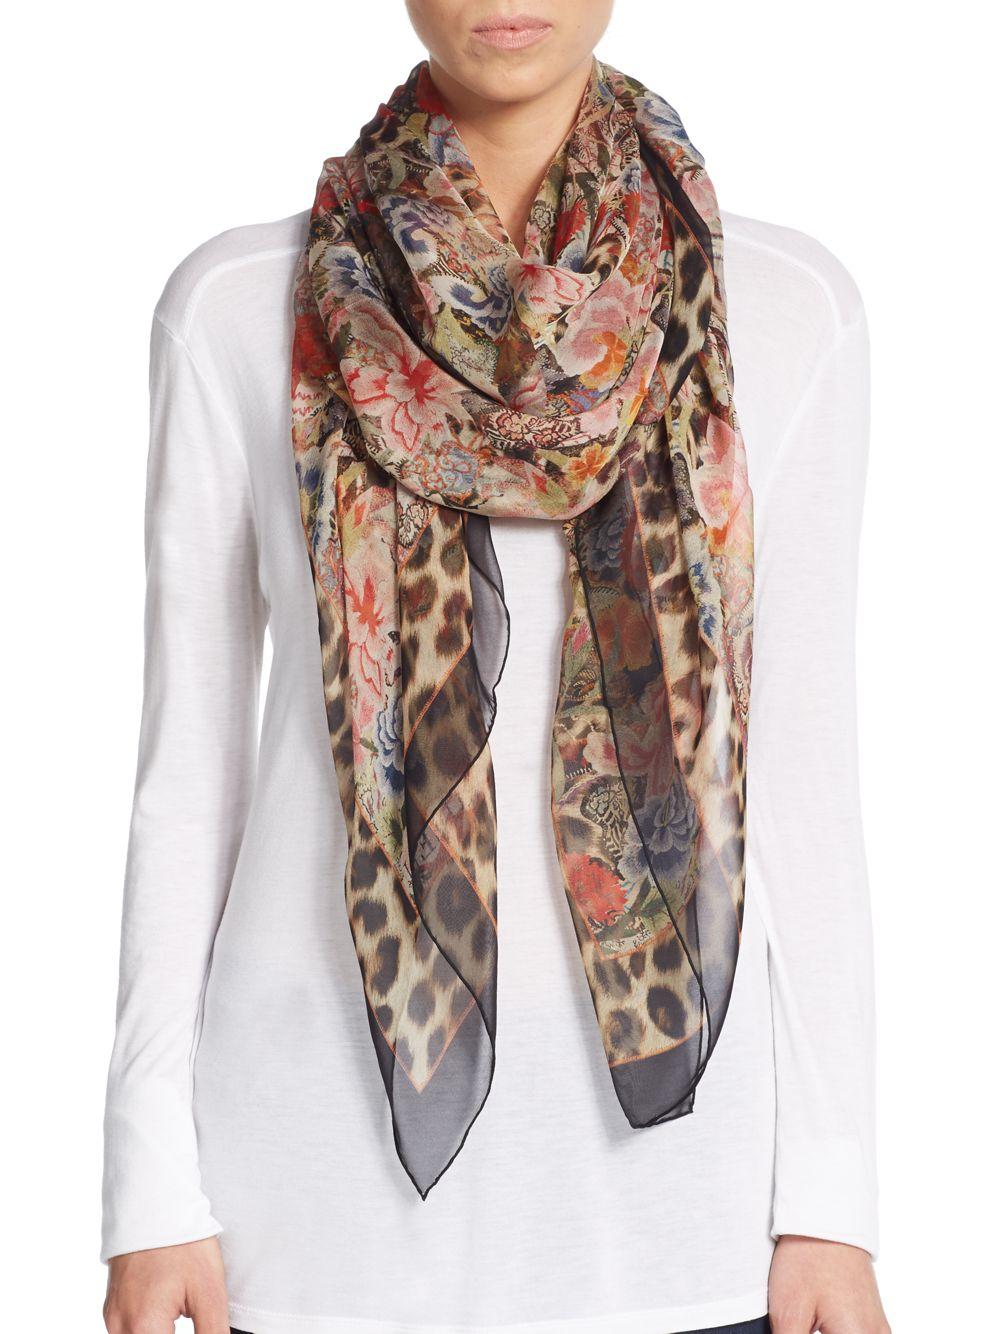 Floral-printed scarf Alexander McQueen 2FEOTR1lwY